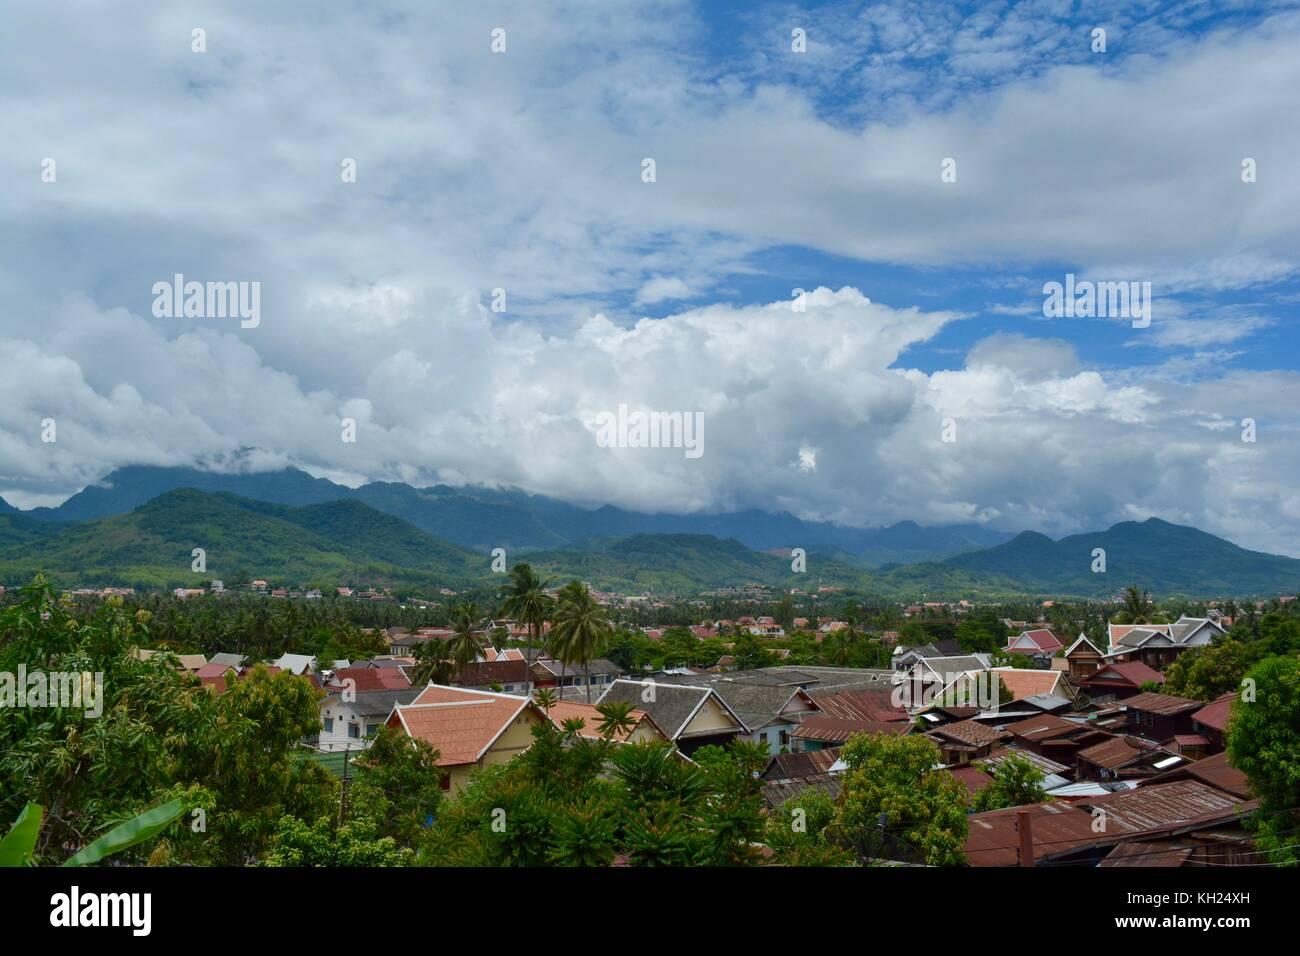 View of the hills around Luang Prabang - Stock Image